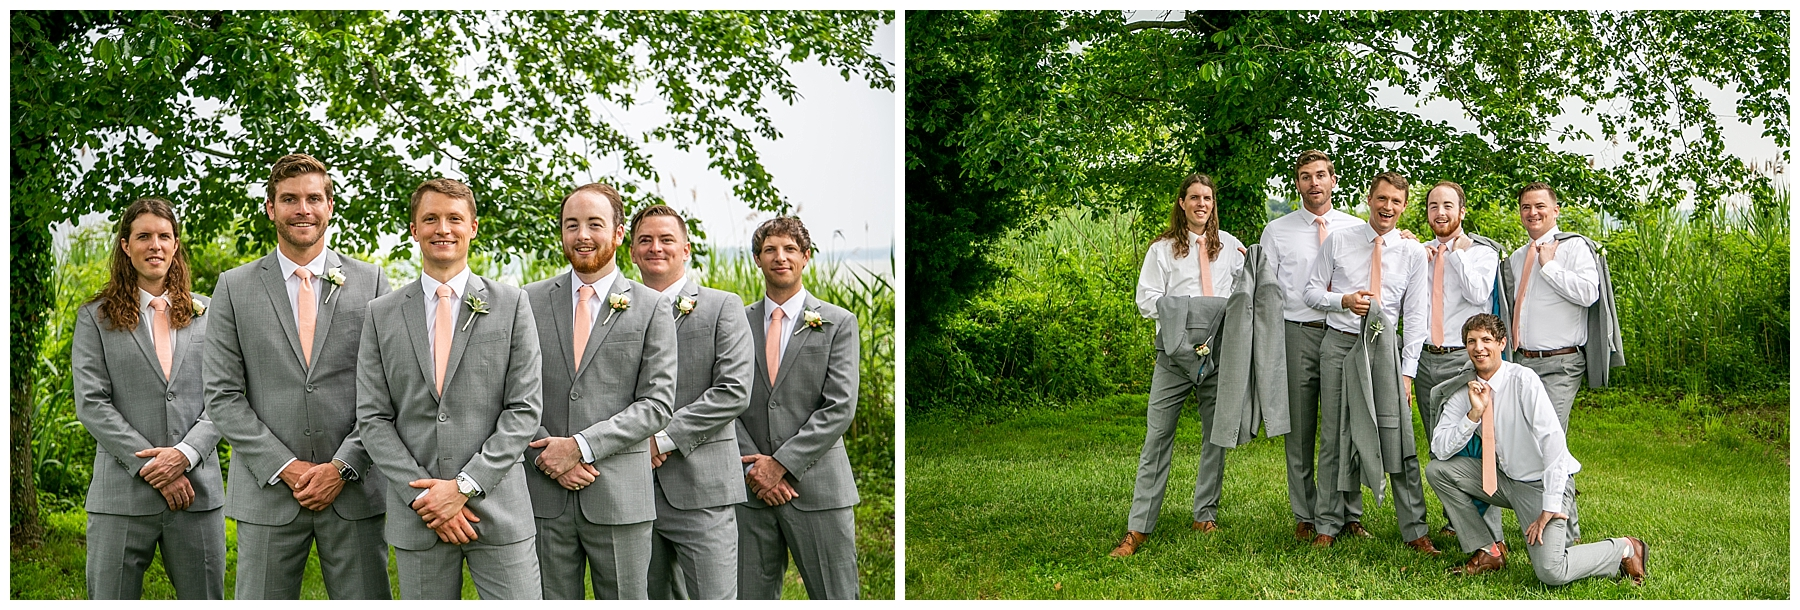 Chelsea Phil Bohemia River Overlook Wedding Living Radiant Photography photos_0070.jpg